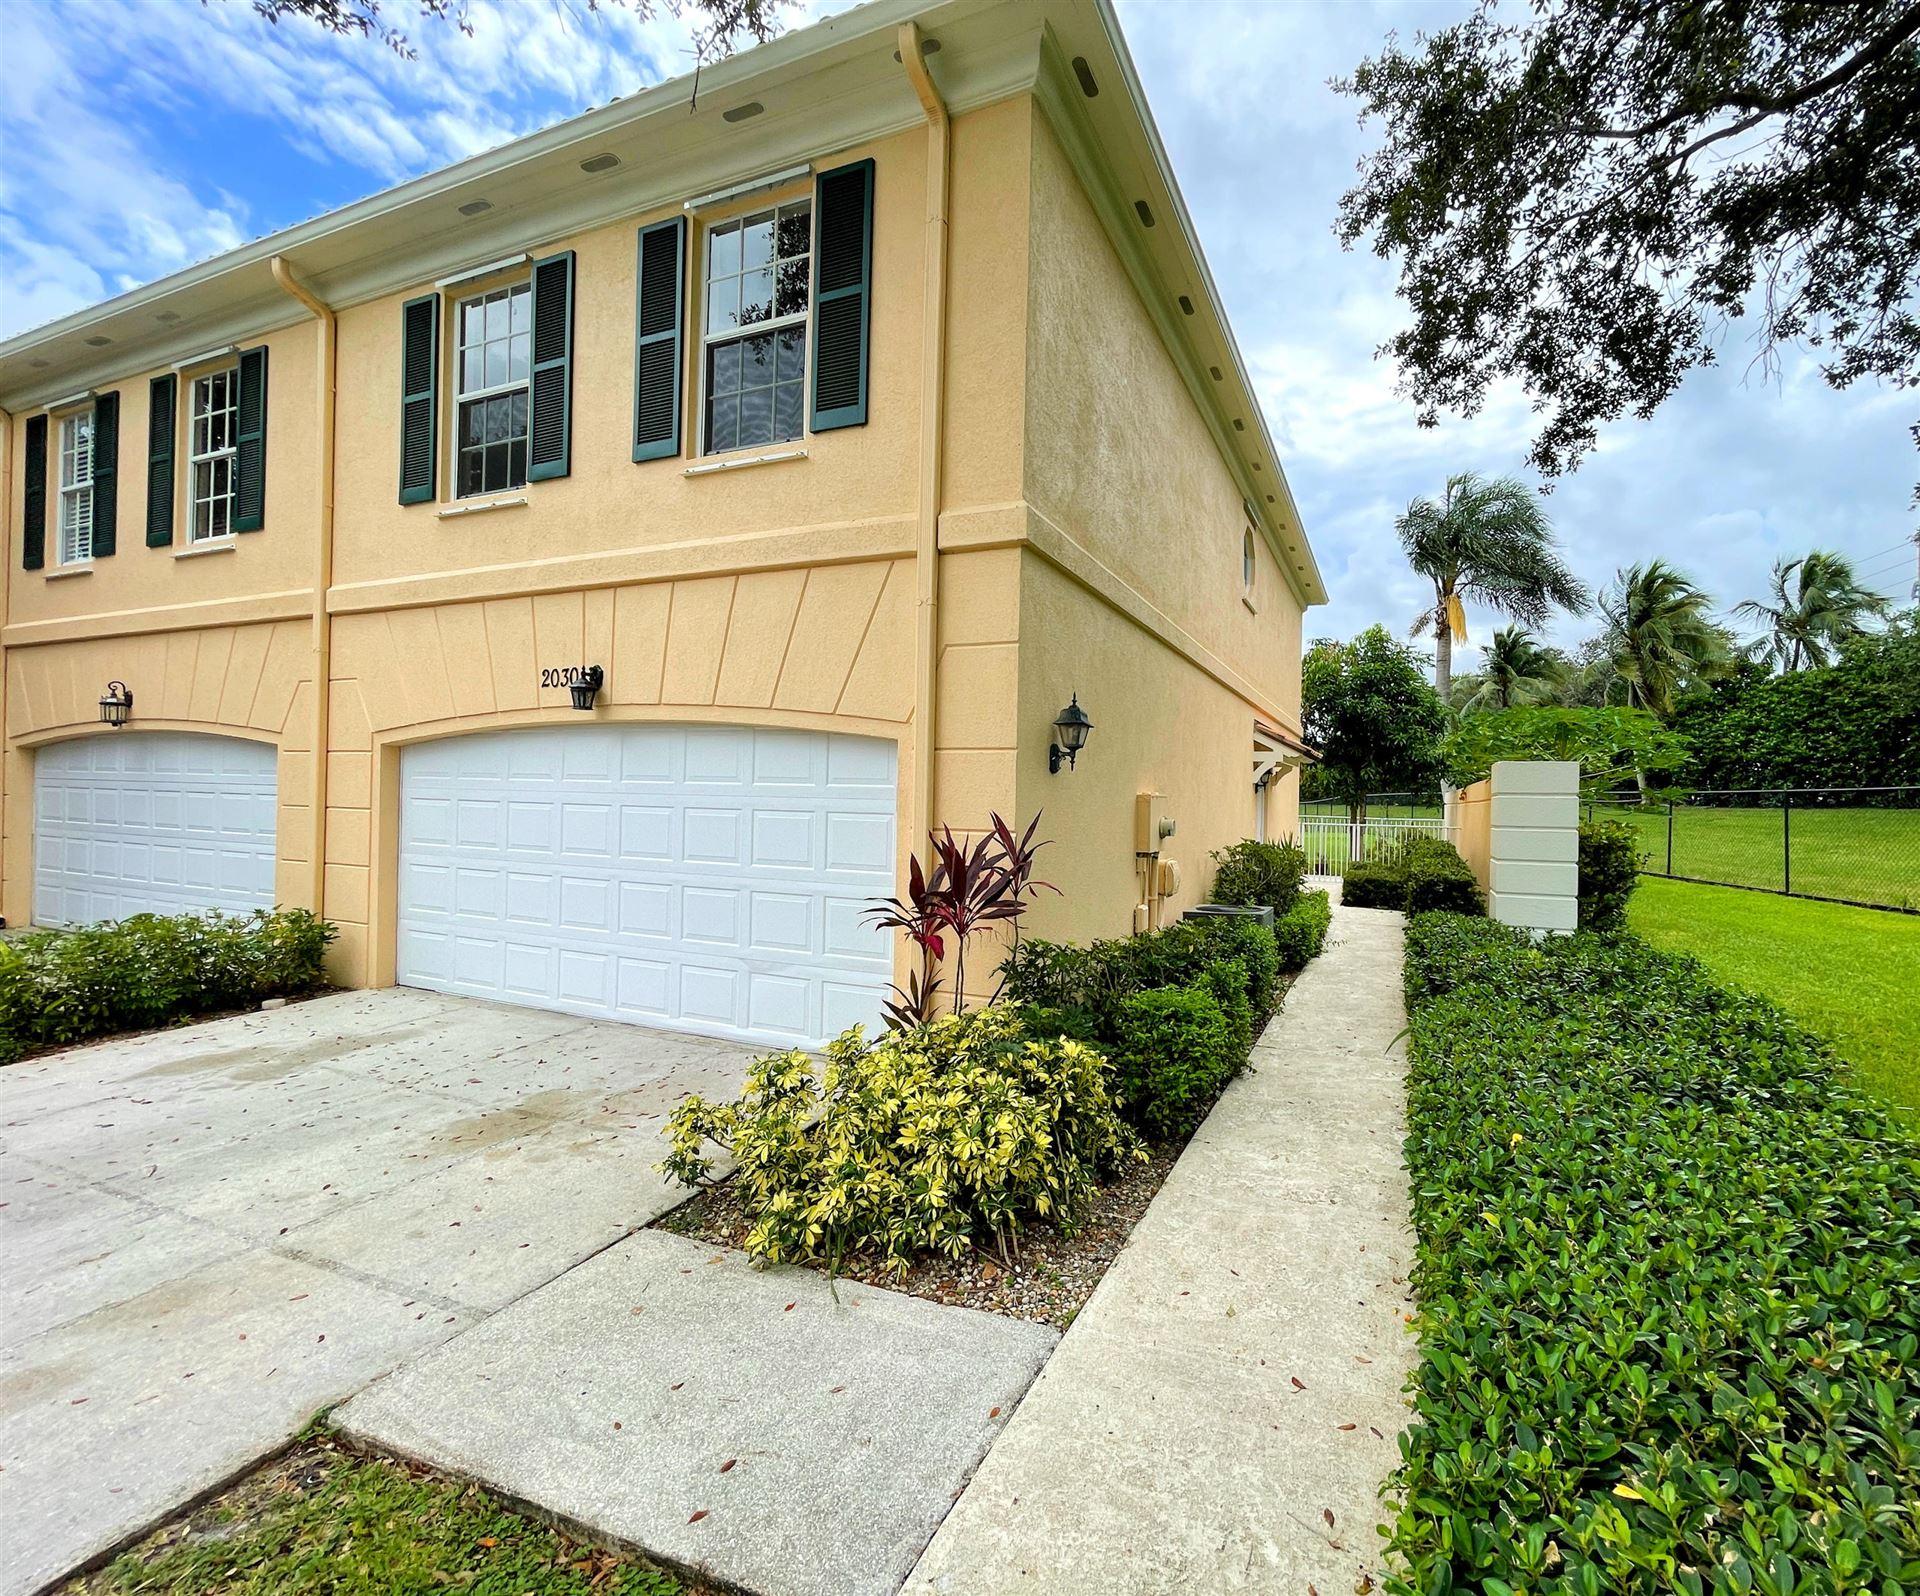 2030 Tigris Drive E, West Palm Beach, FL 33411 - MLS#: RX-10731682